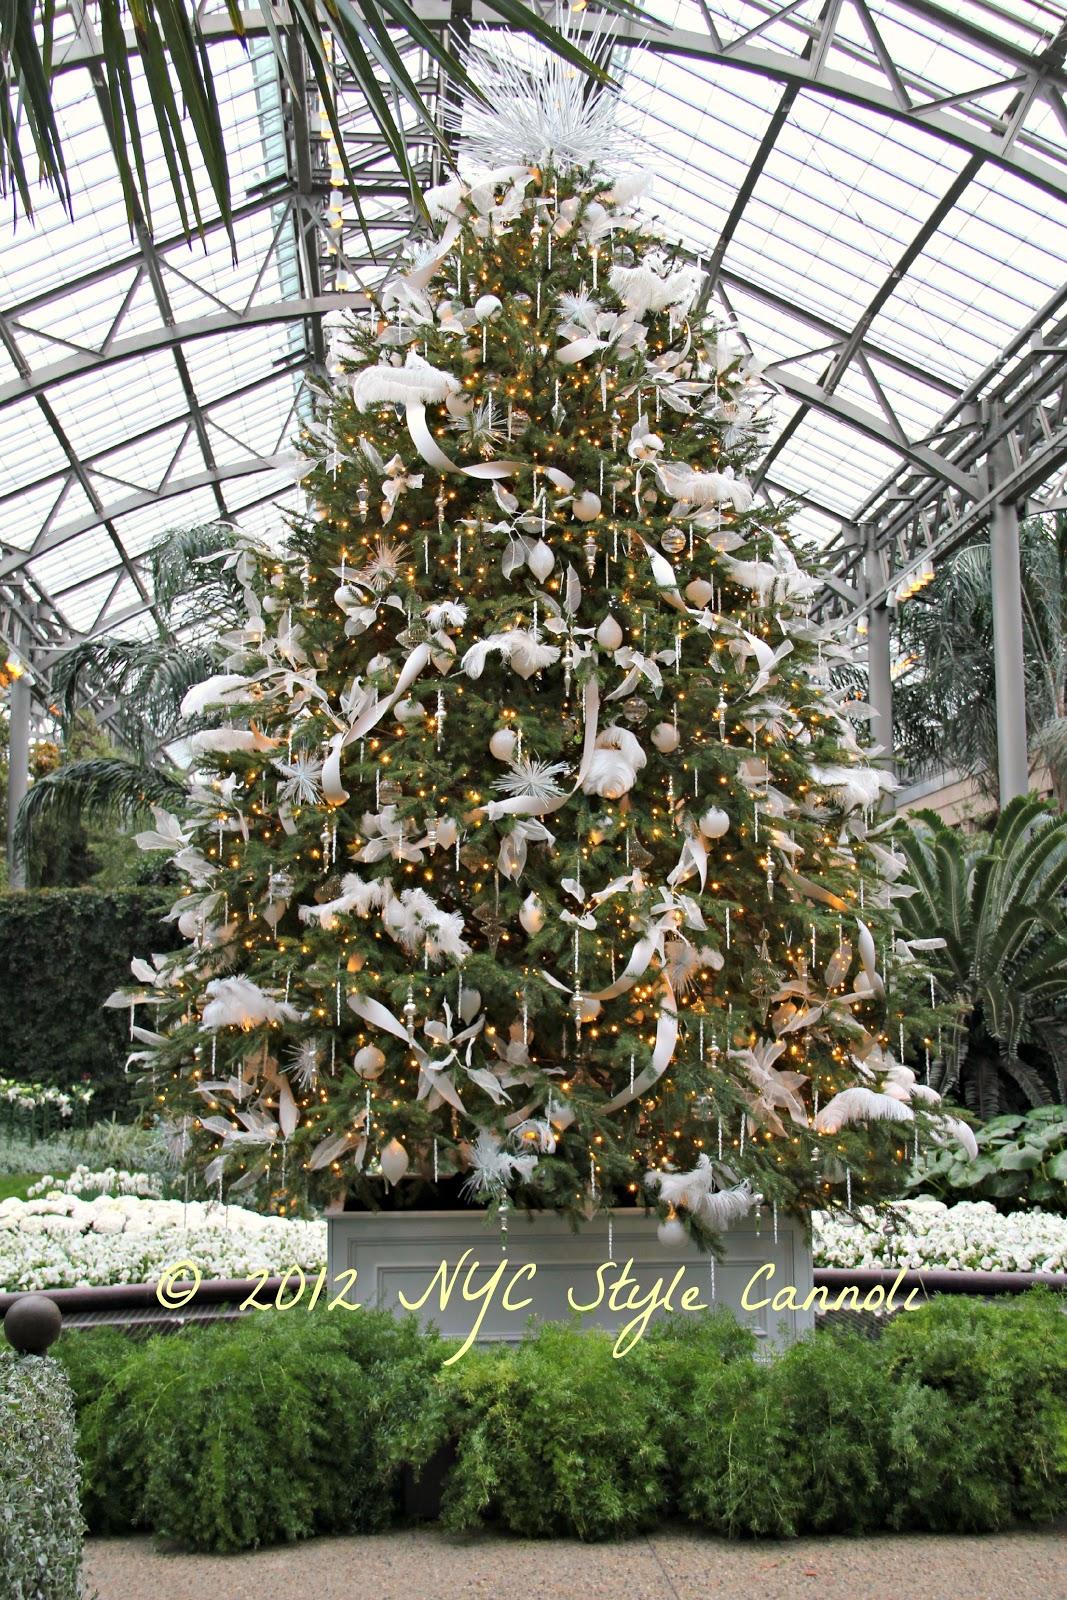 A Longwood Gardens Christmas 2012 | NYC, Style & a little Cannoli